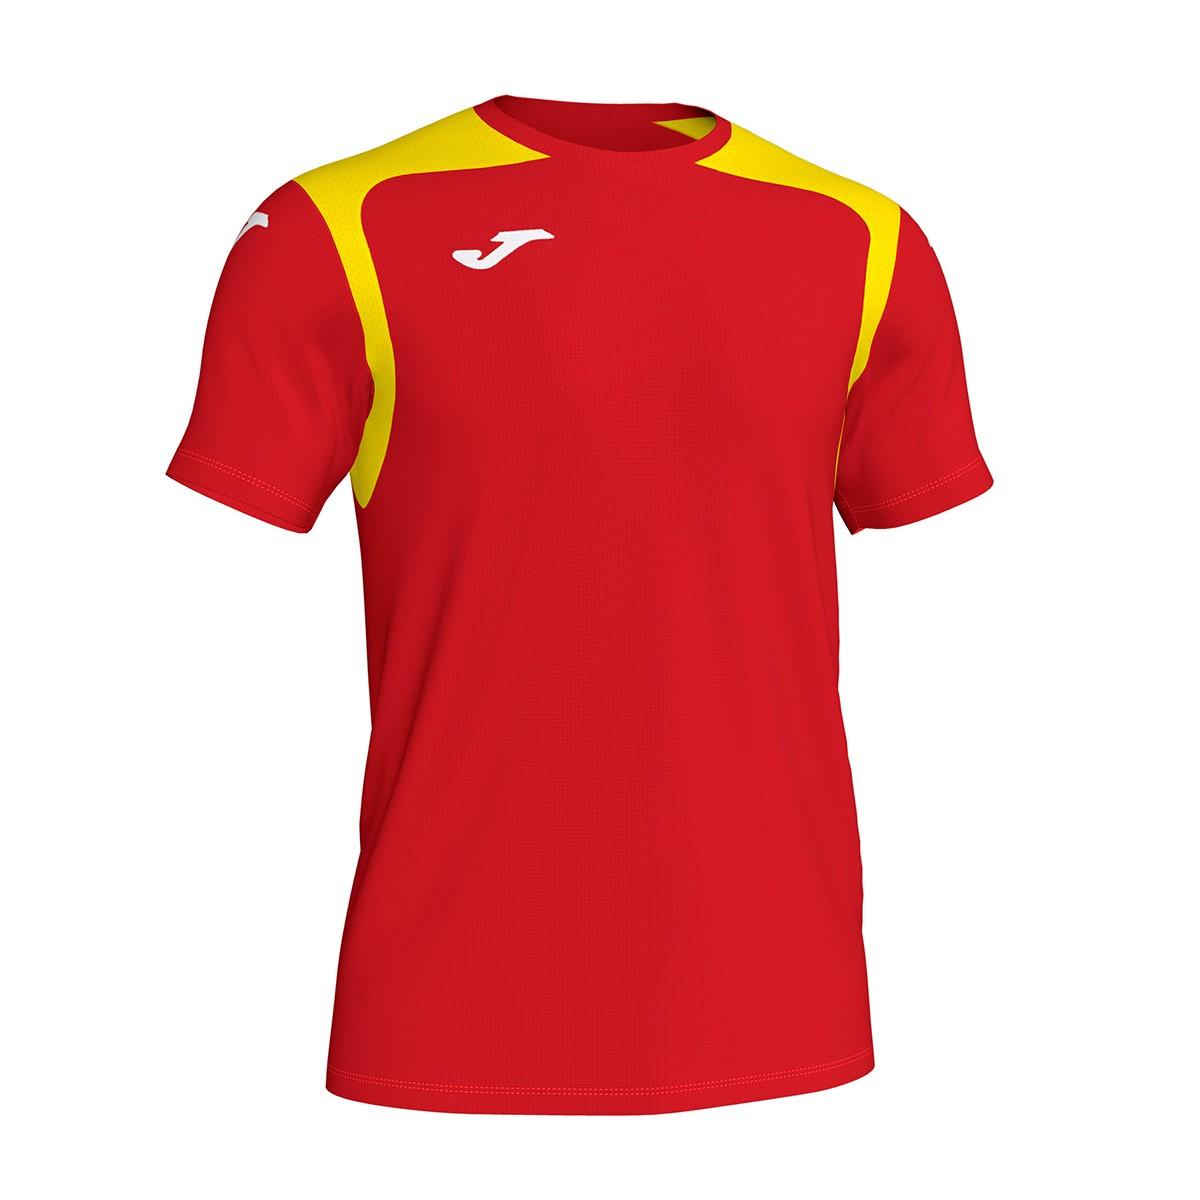 a2b00ae4b Jersey Joma Champion V m c Red-Yellow - Football store Fútbol Emotion